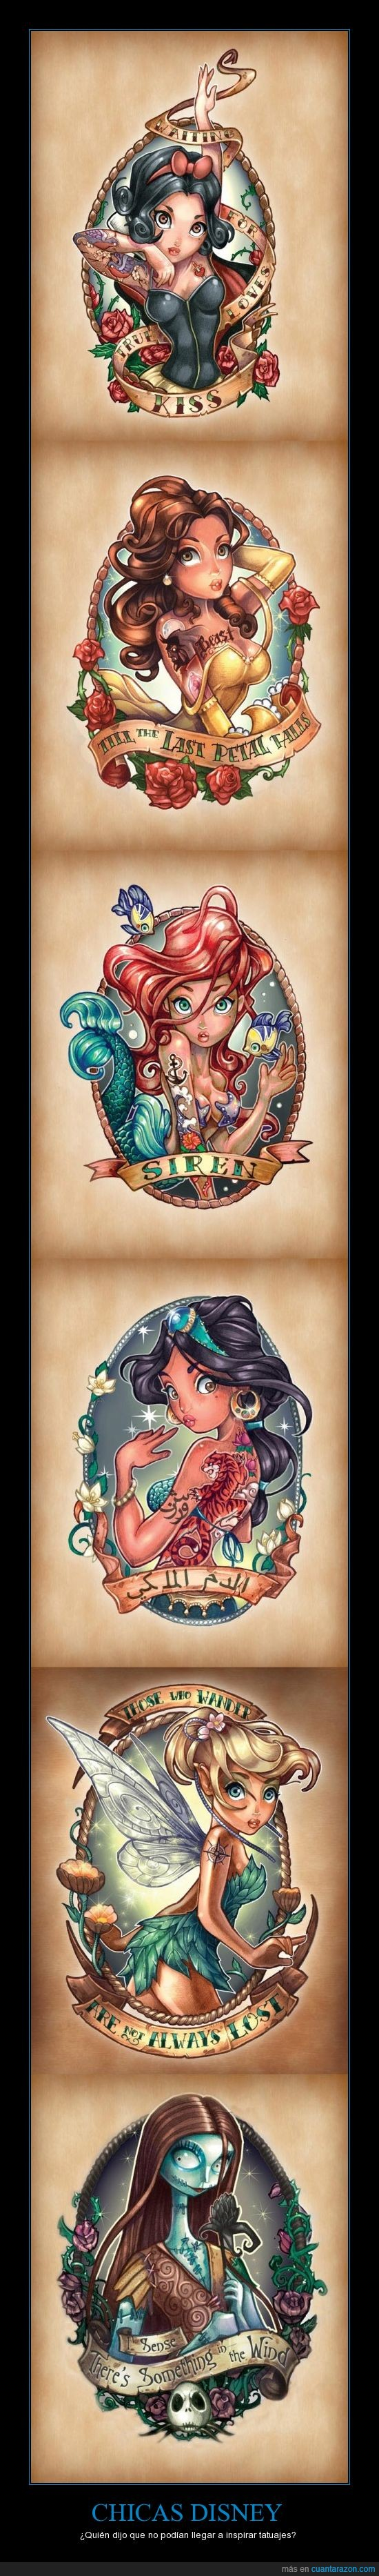 Cuánta Razón Chicas Disney